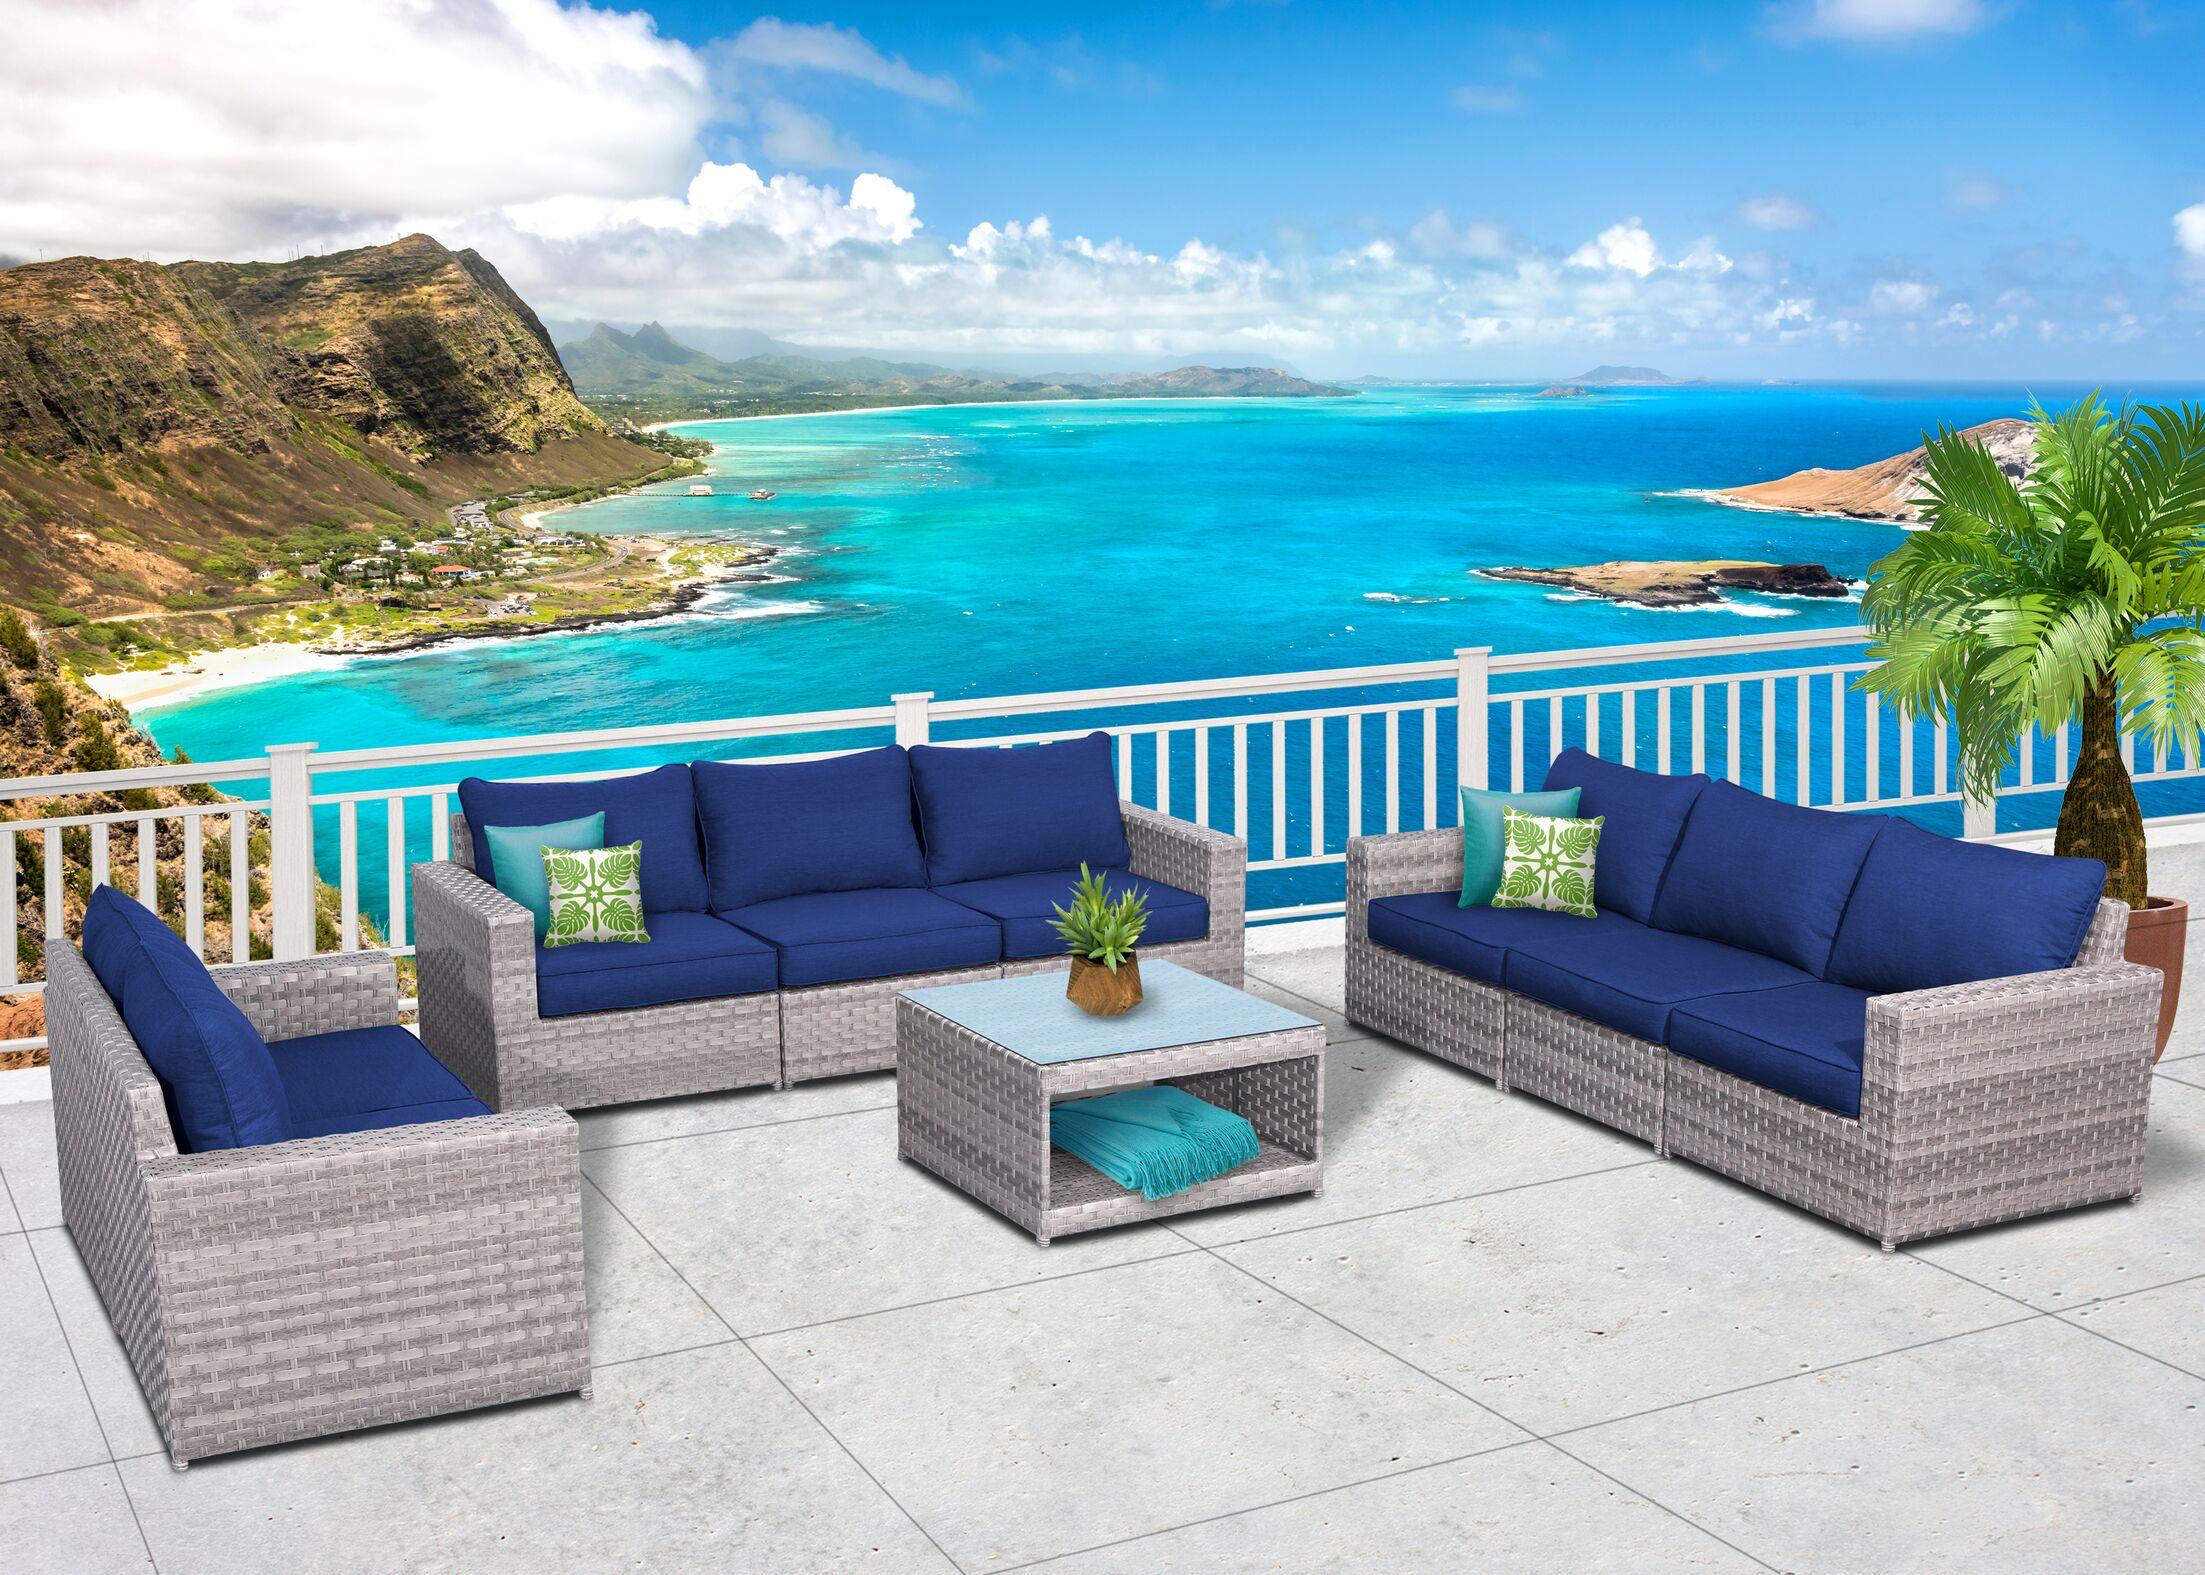 Burkley Olefin 9 Piece Sofa Seating Group Cushion Color: Navy Blue